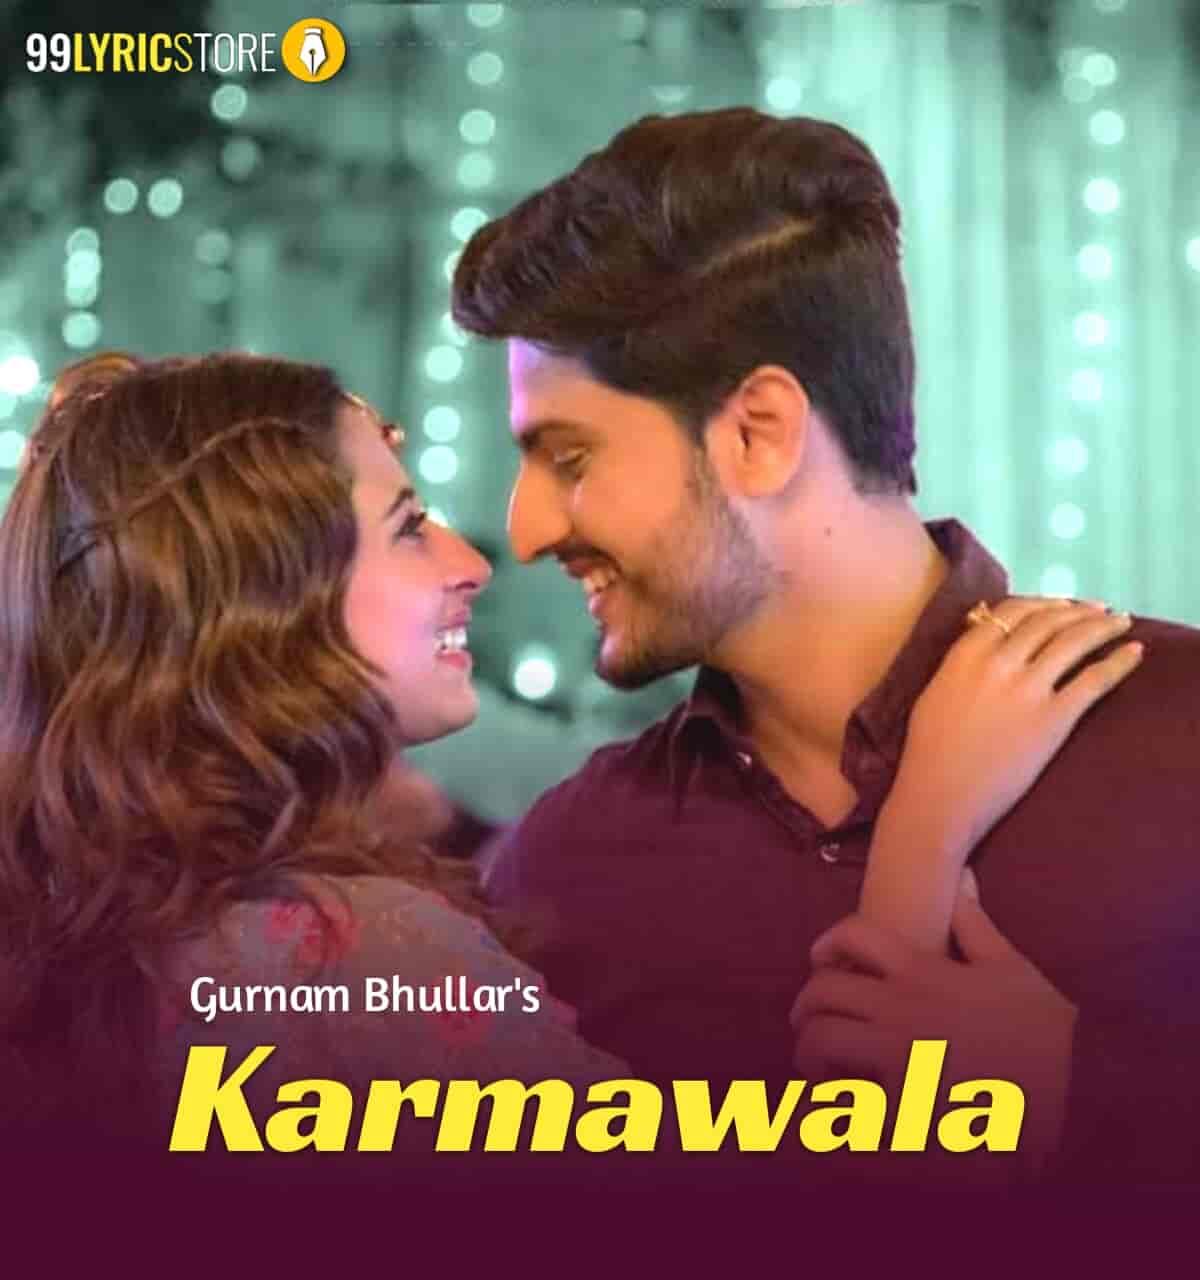 Karmawala Punjabi Song Sung by Gurnam Bhullar